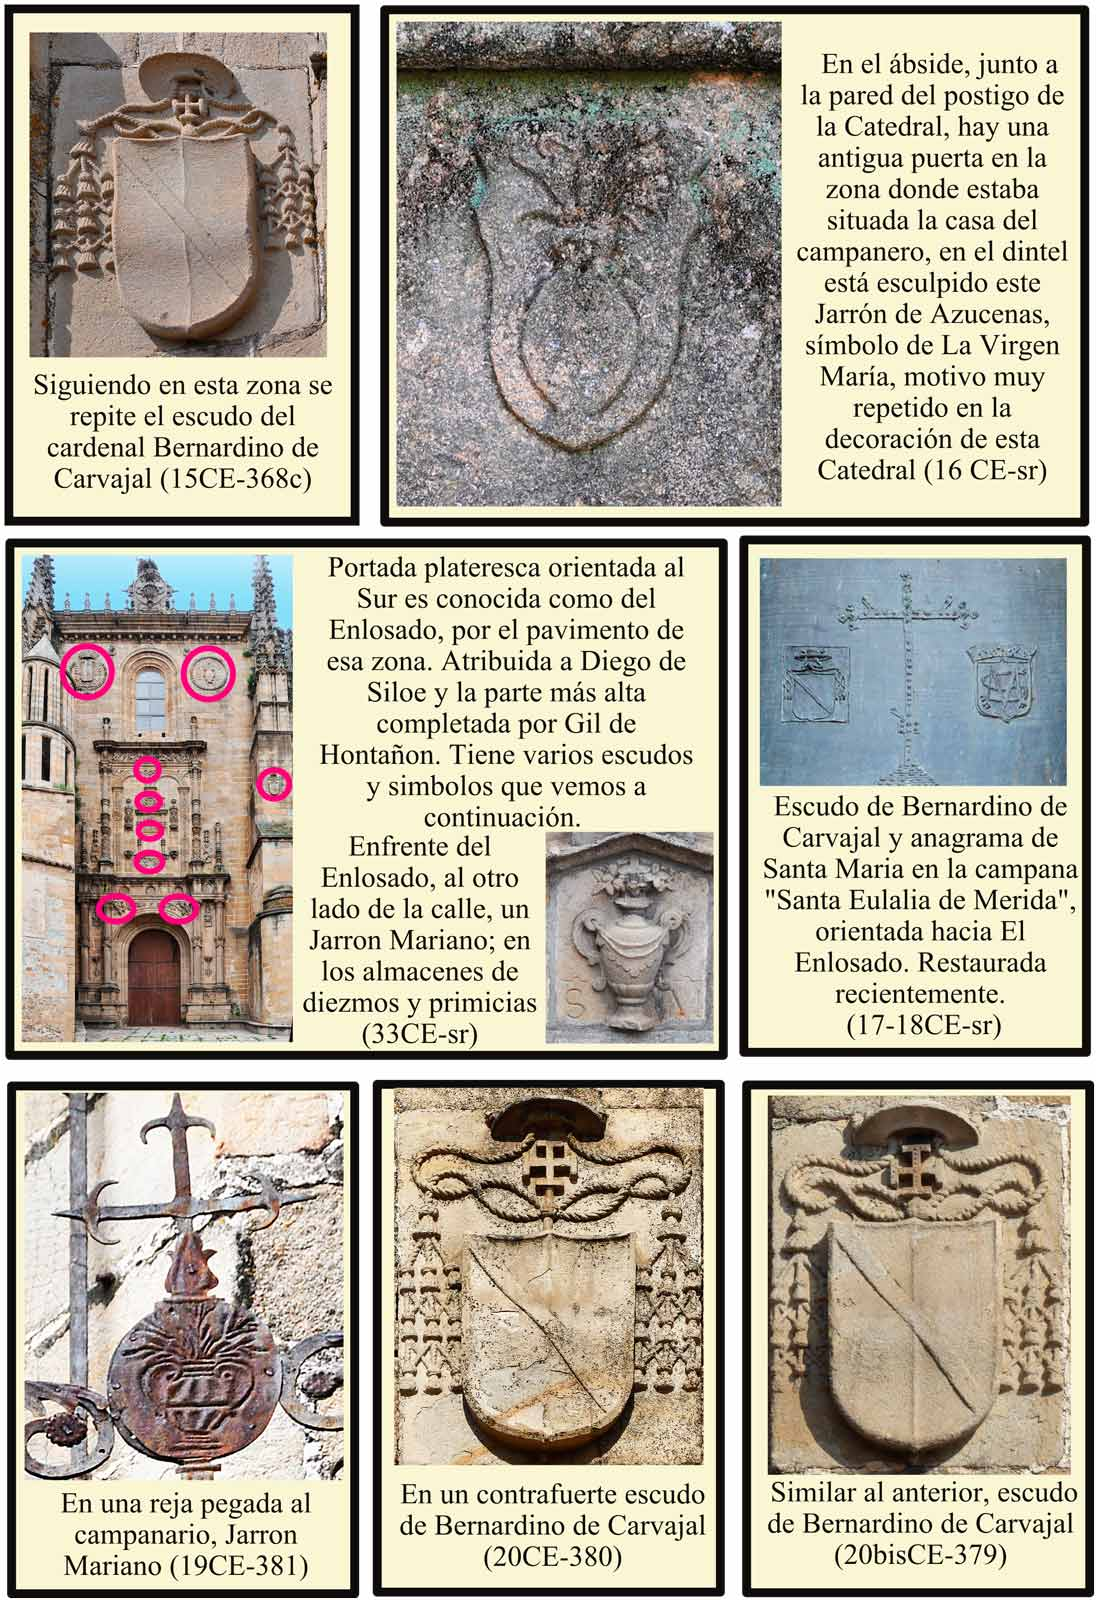 Portada Enlosado Escudos Campana Santa Eulalia de Merida